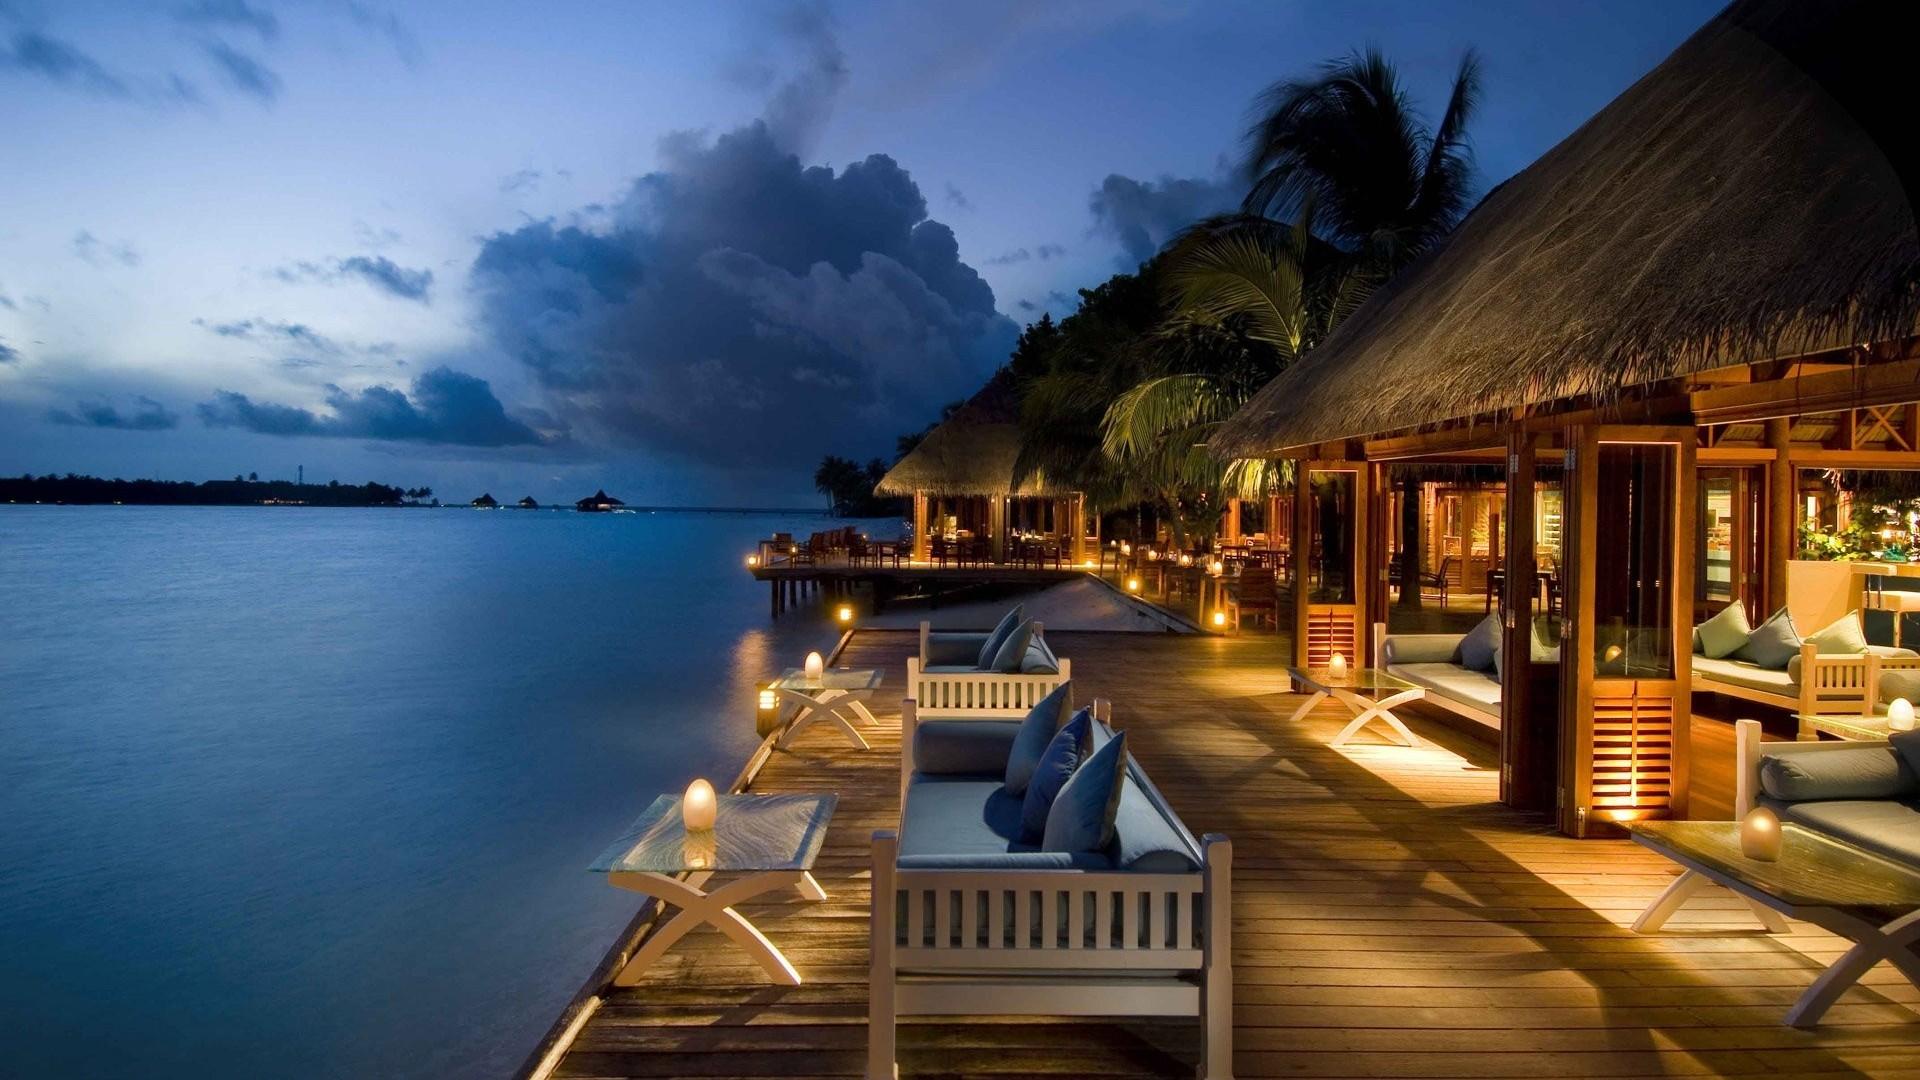 Resort Wallpaper in high resolution for Get Maldives Resort 1920x1080